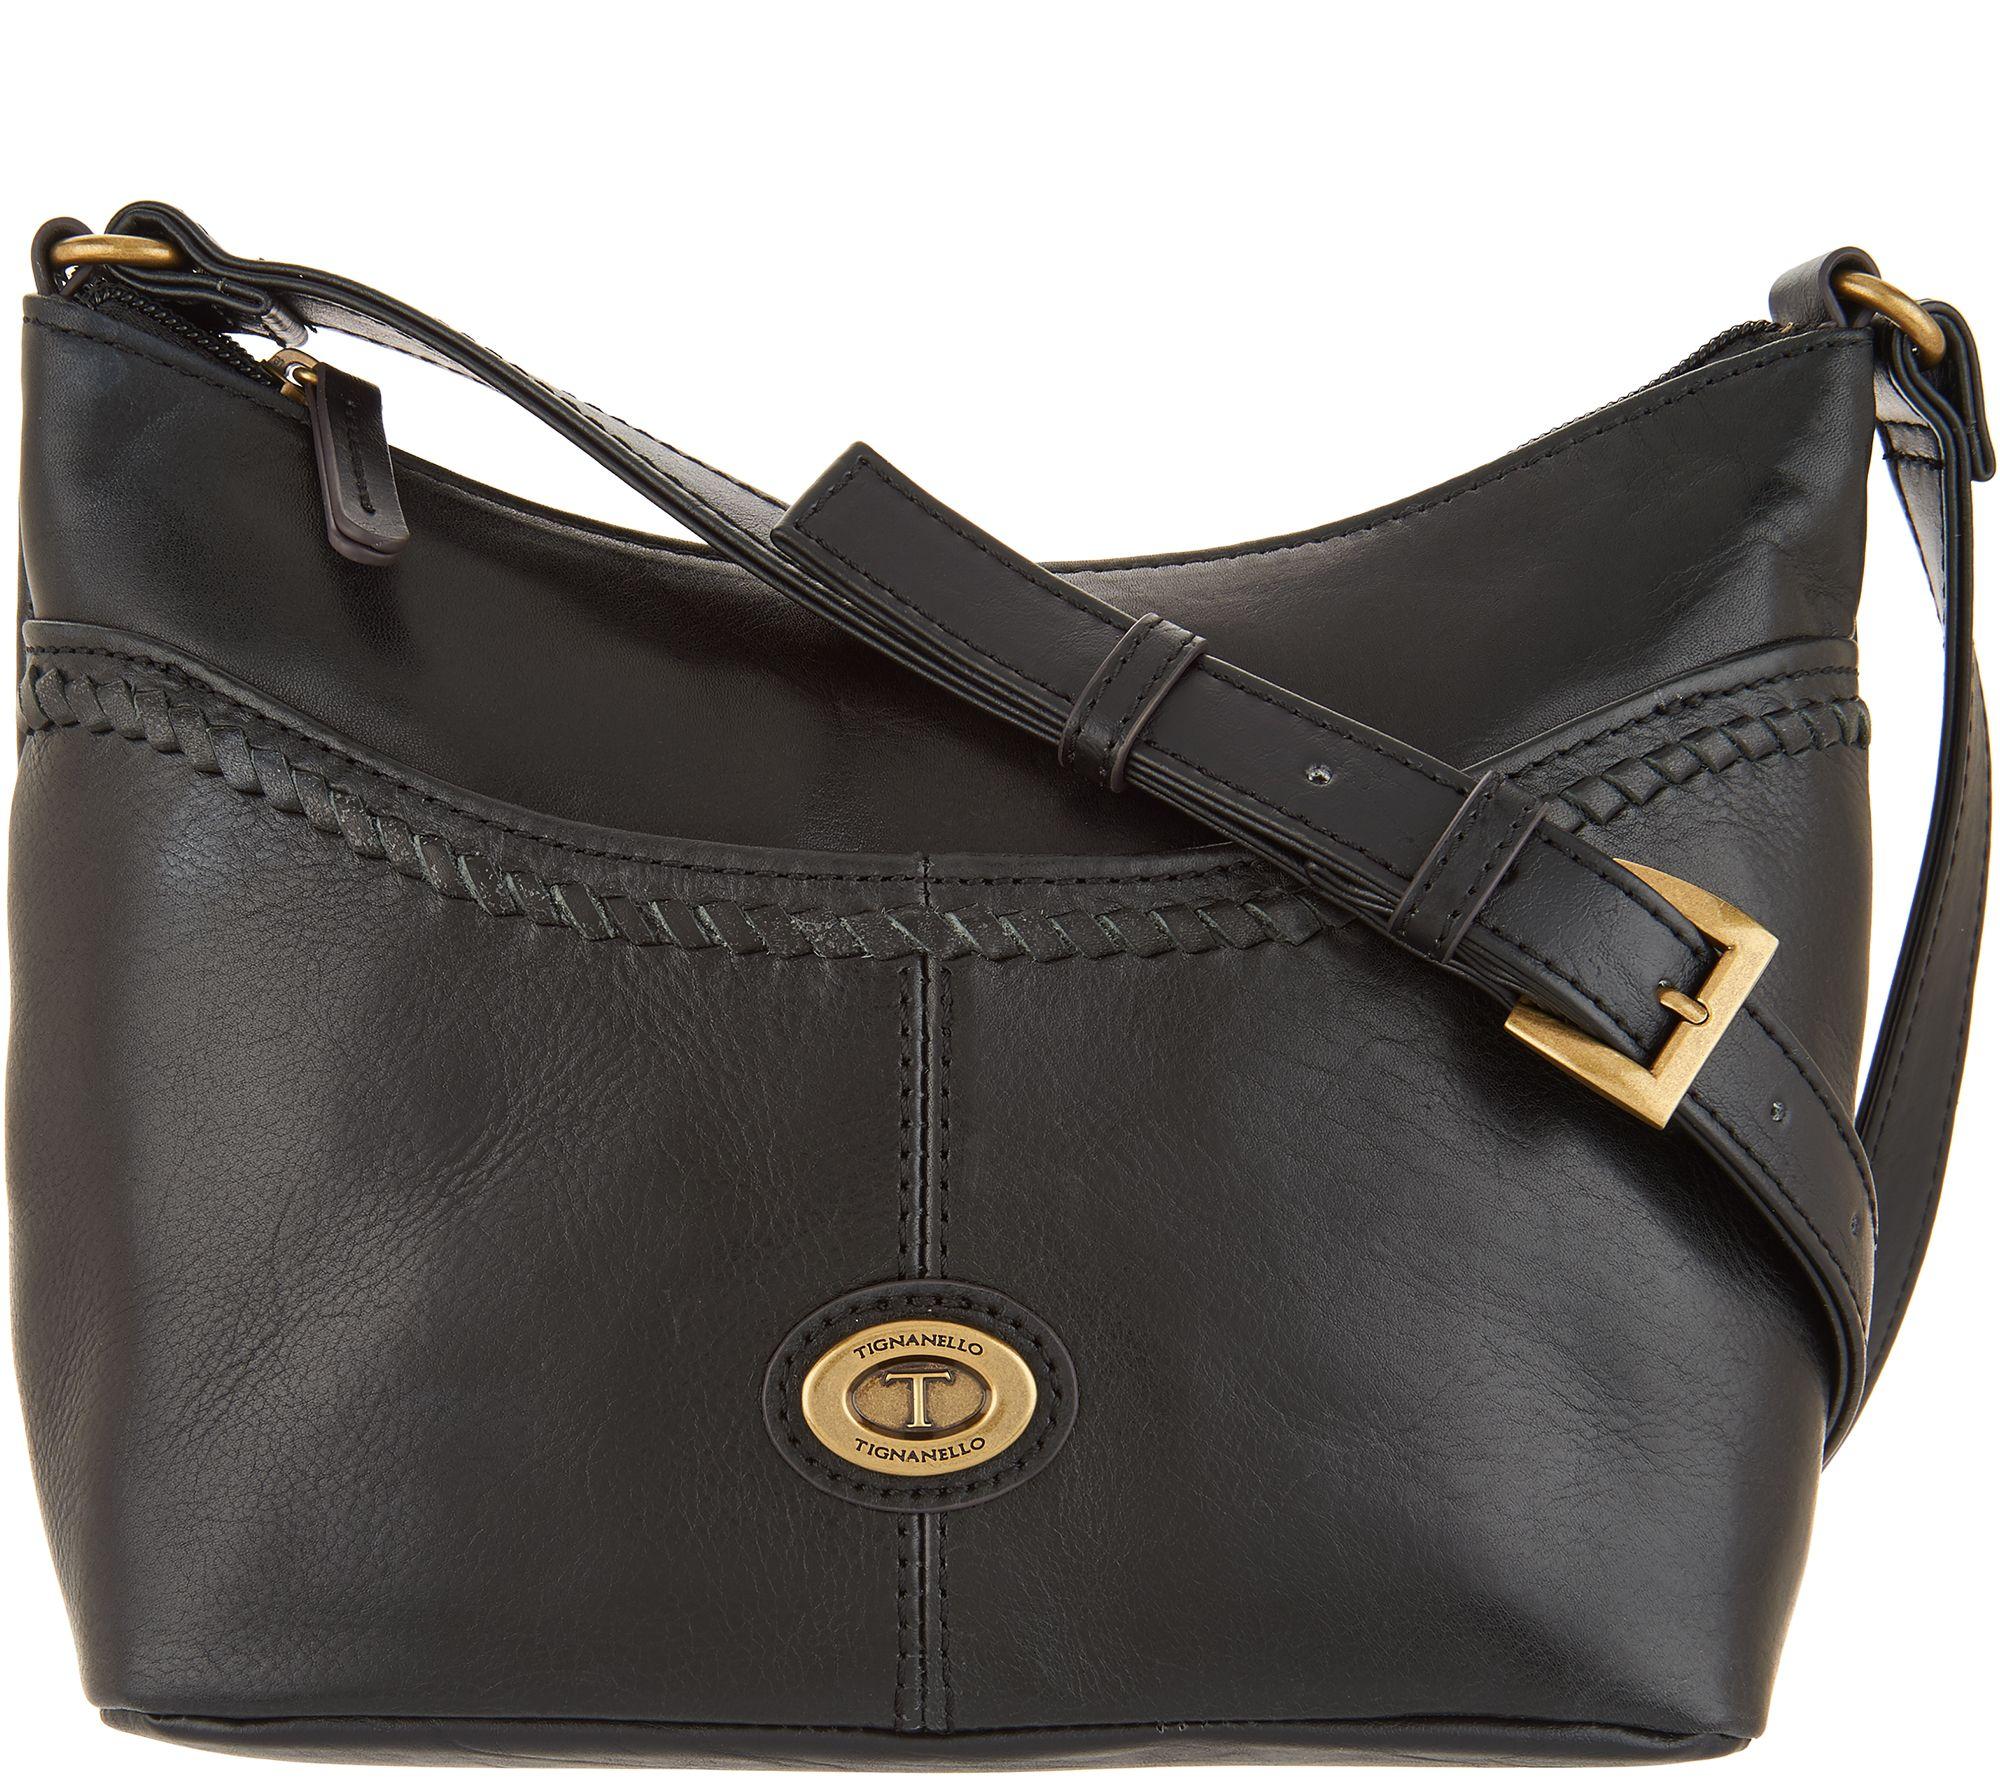 Tignanello Vintage Leather Convertible